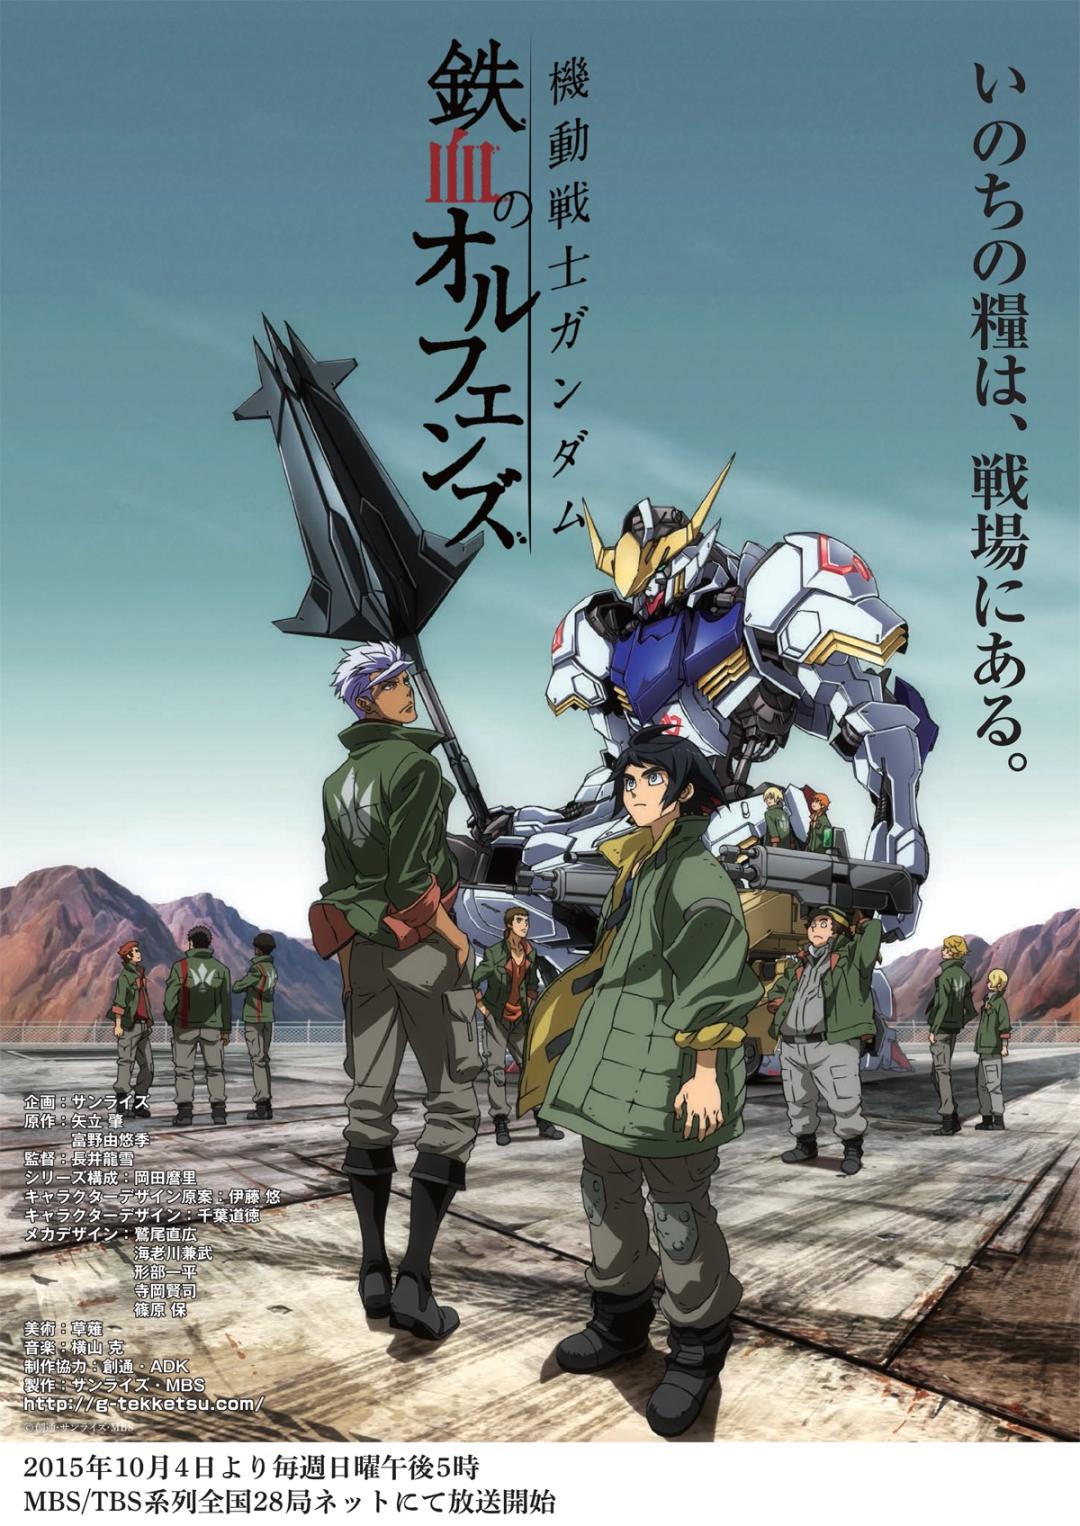 IBO_Gundam_Poster_1.jpg